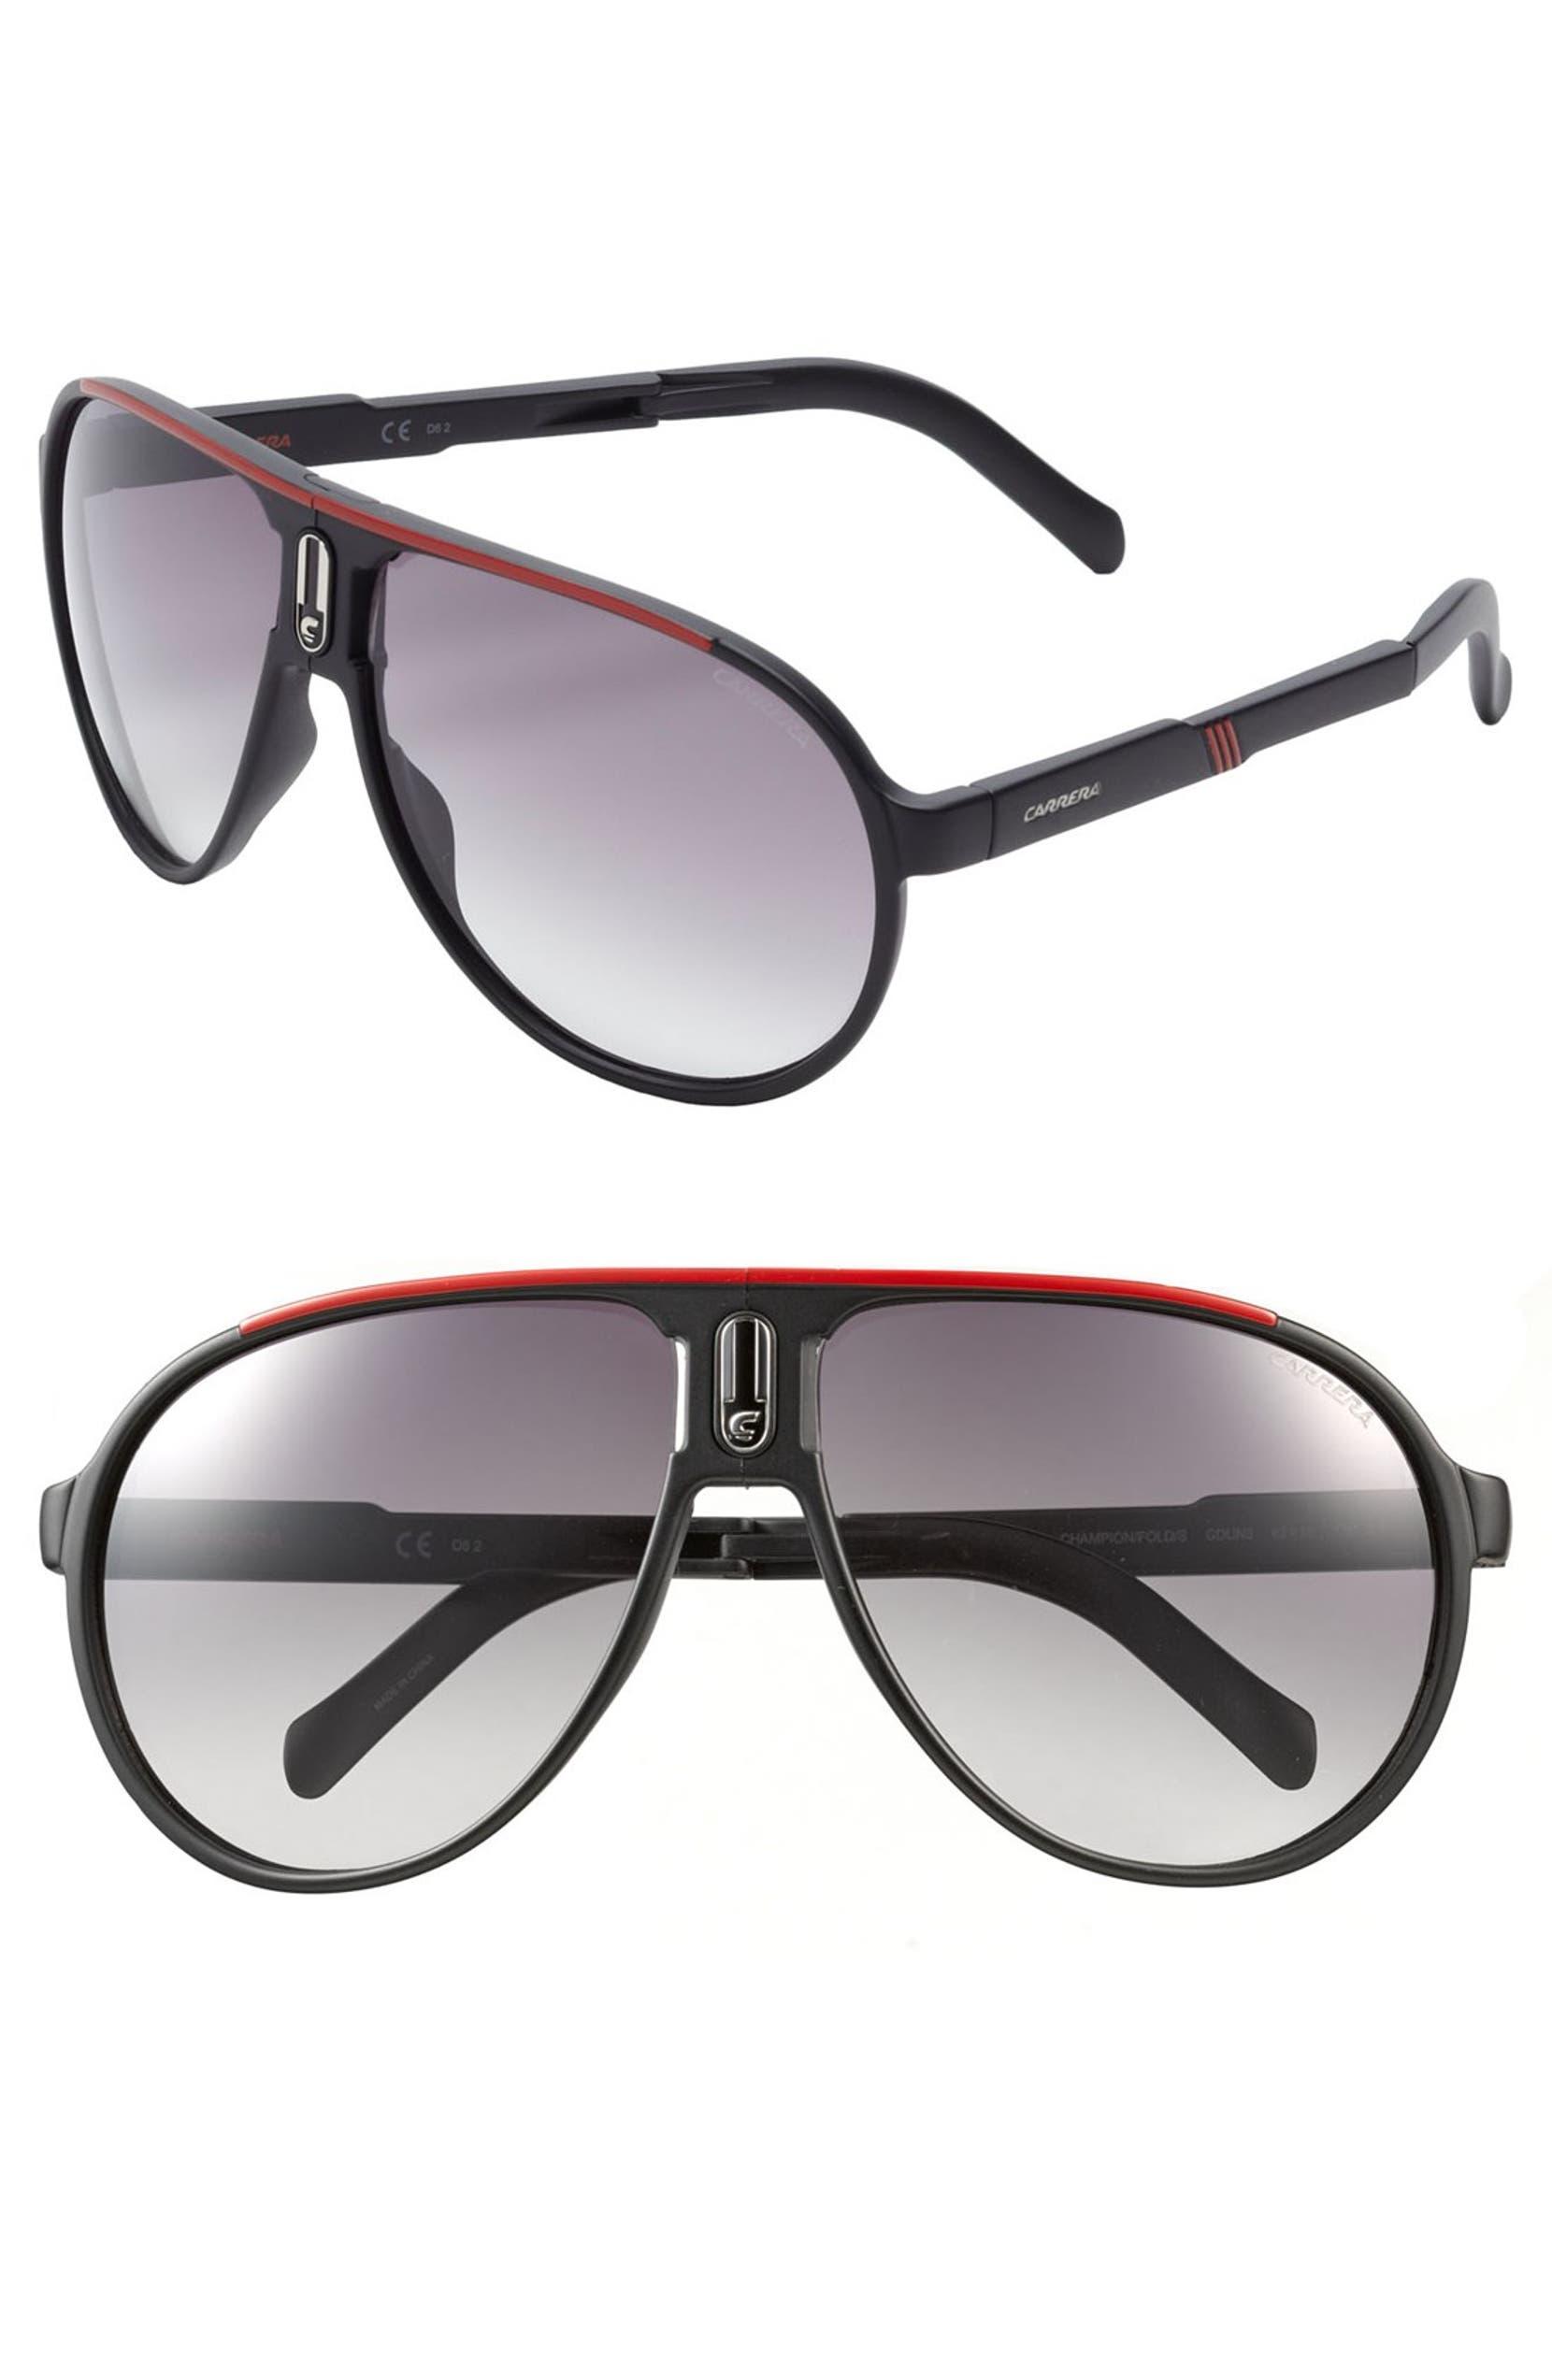 16aad0b69cb2c Polarized Sunglasses Carrera  champion  62mm Folding Nordstrom Eyewear  qwUXxU6rt